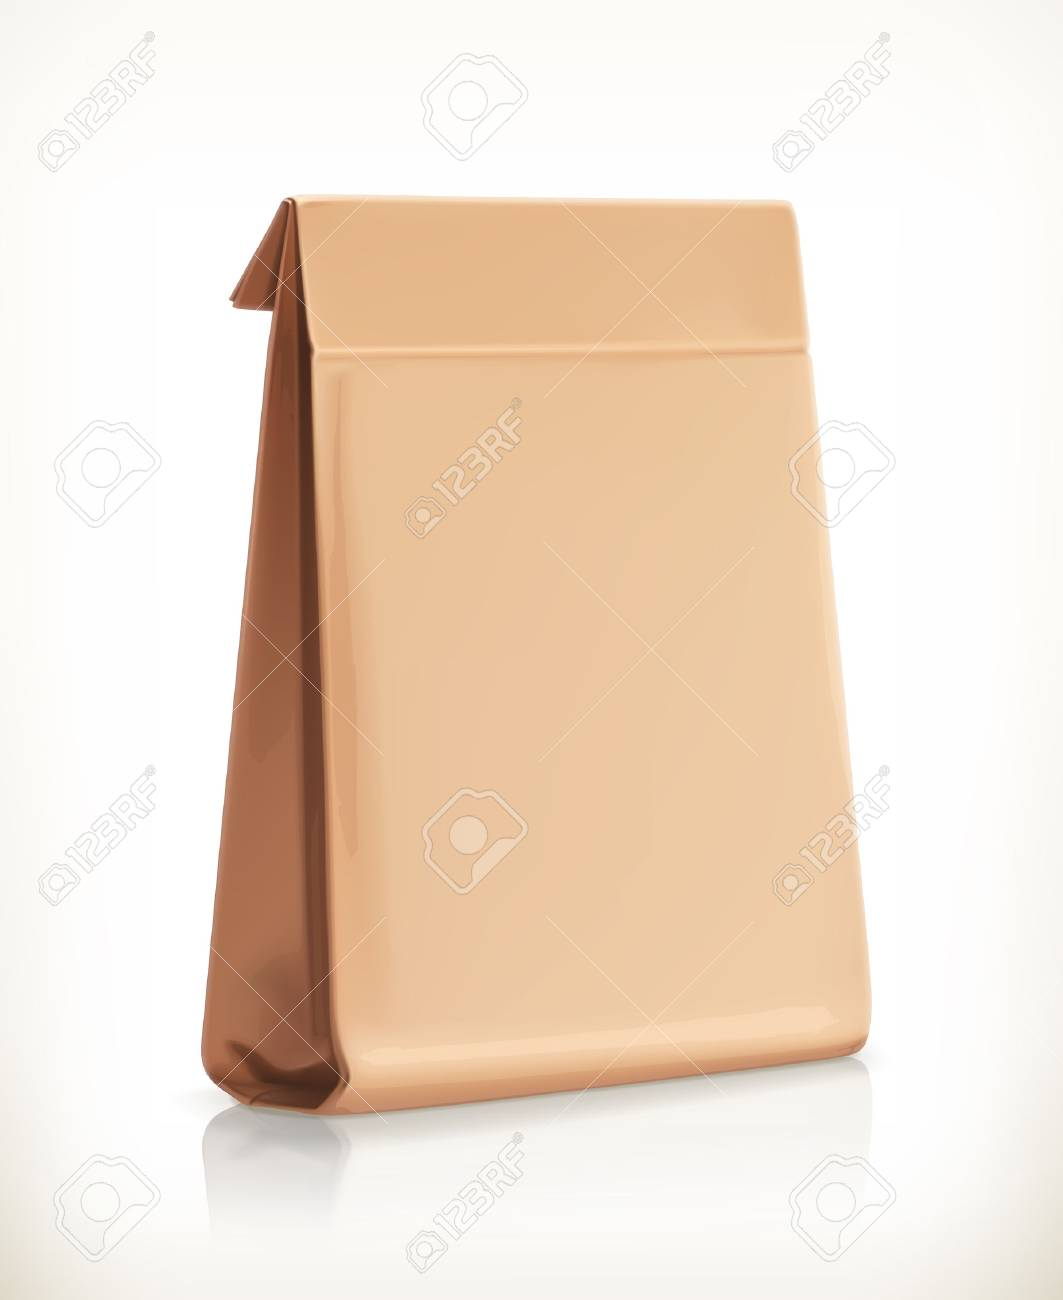 Paper bag vector - Paper Bag Vector Object Stock Vector 33198613